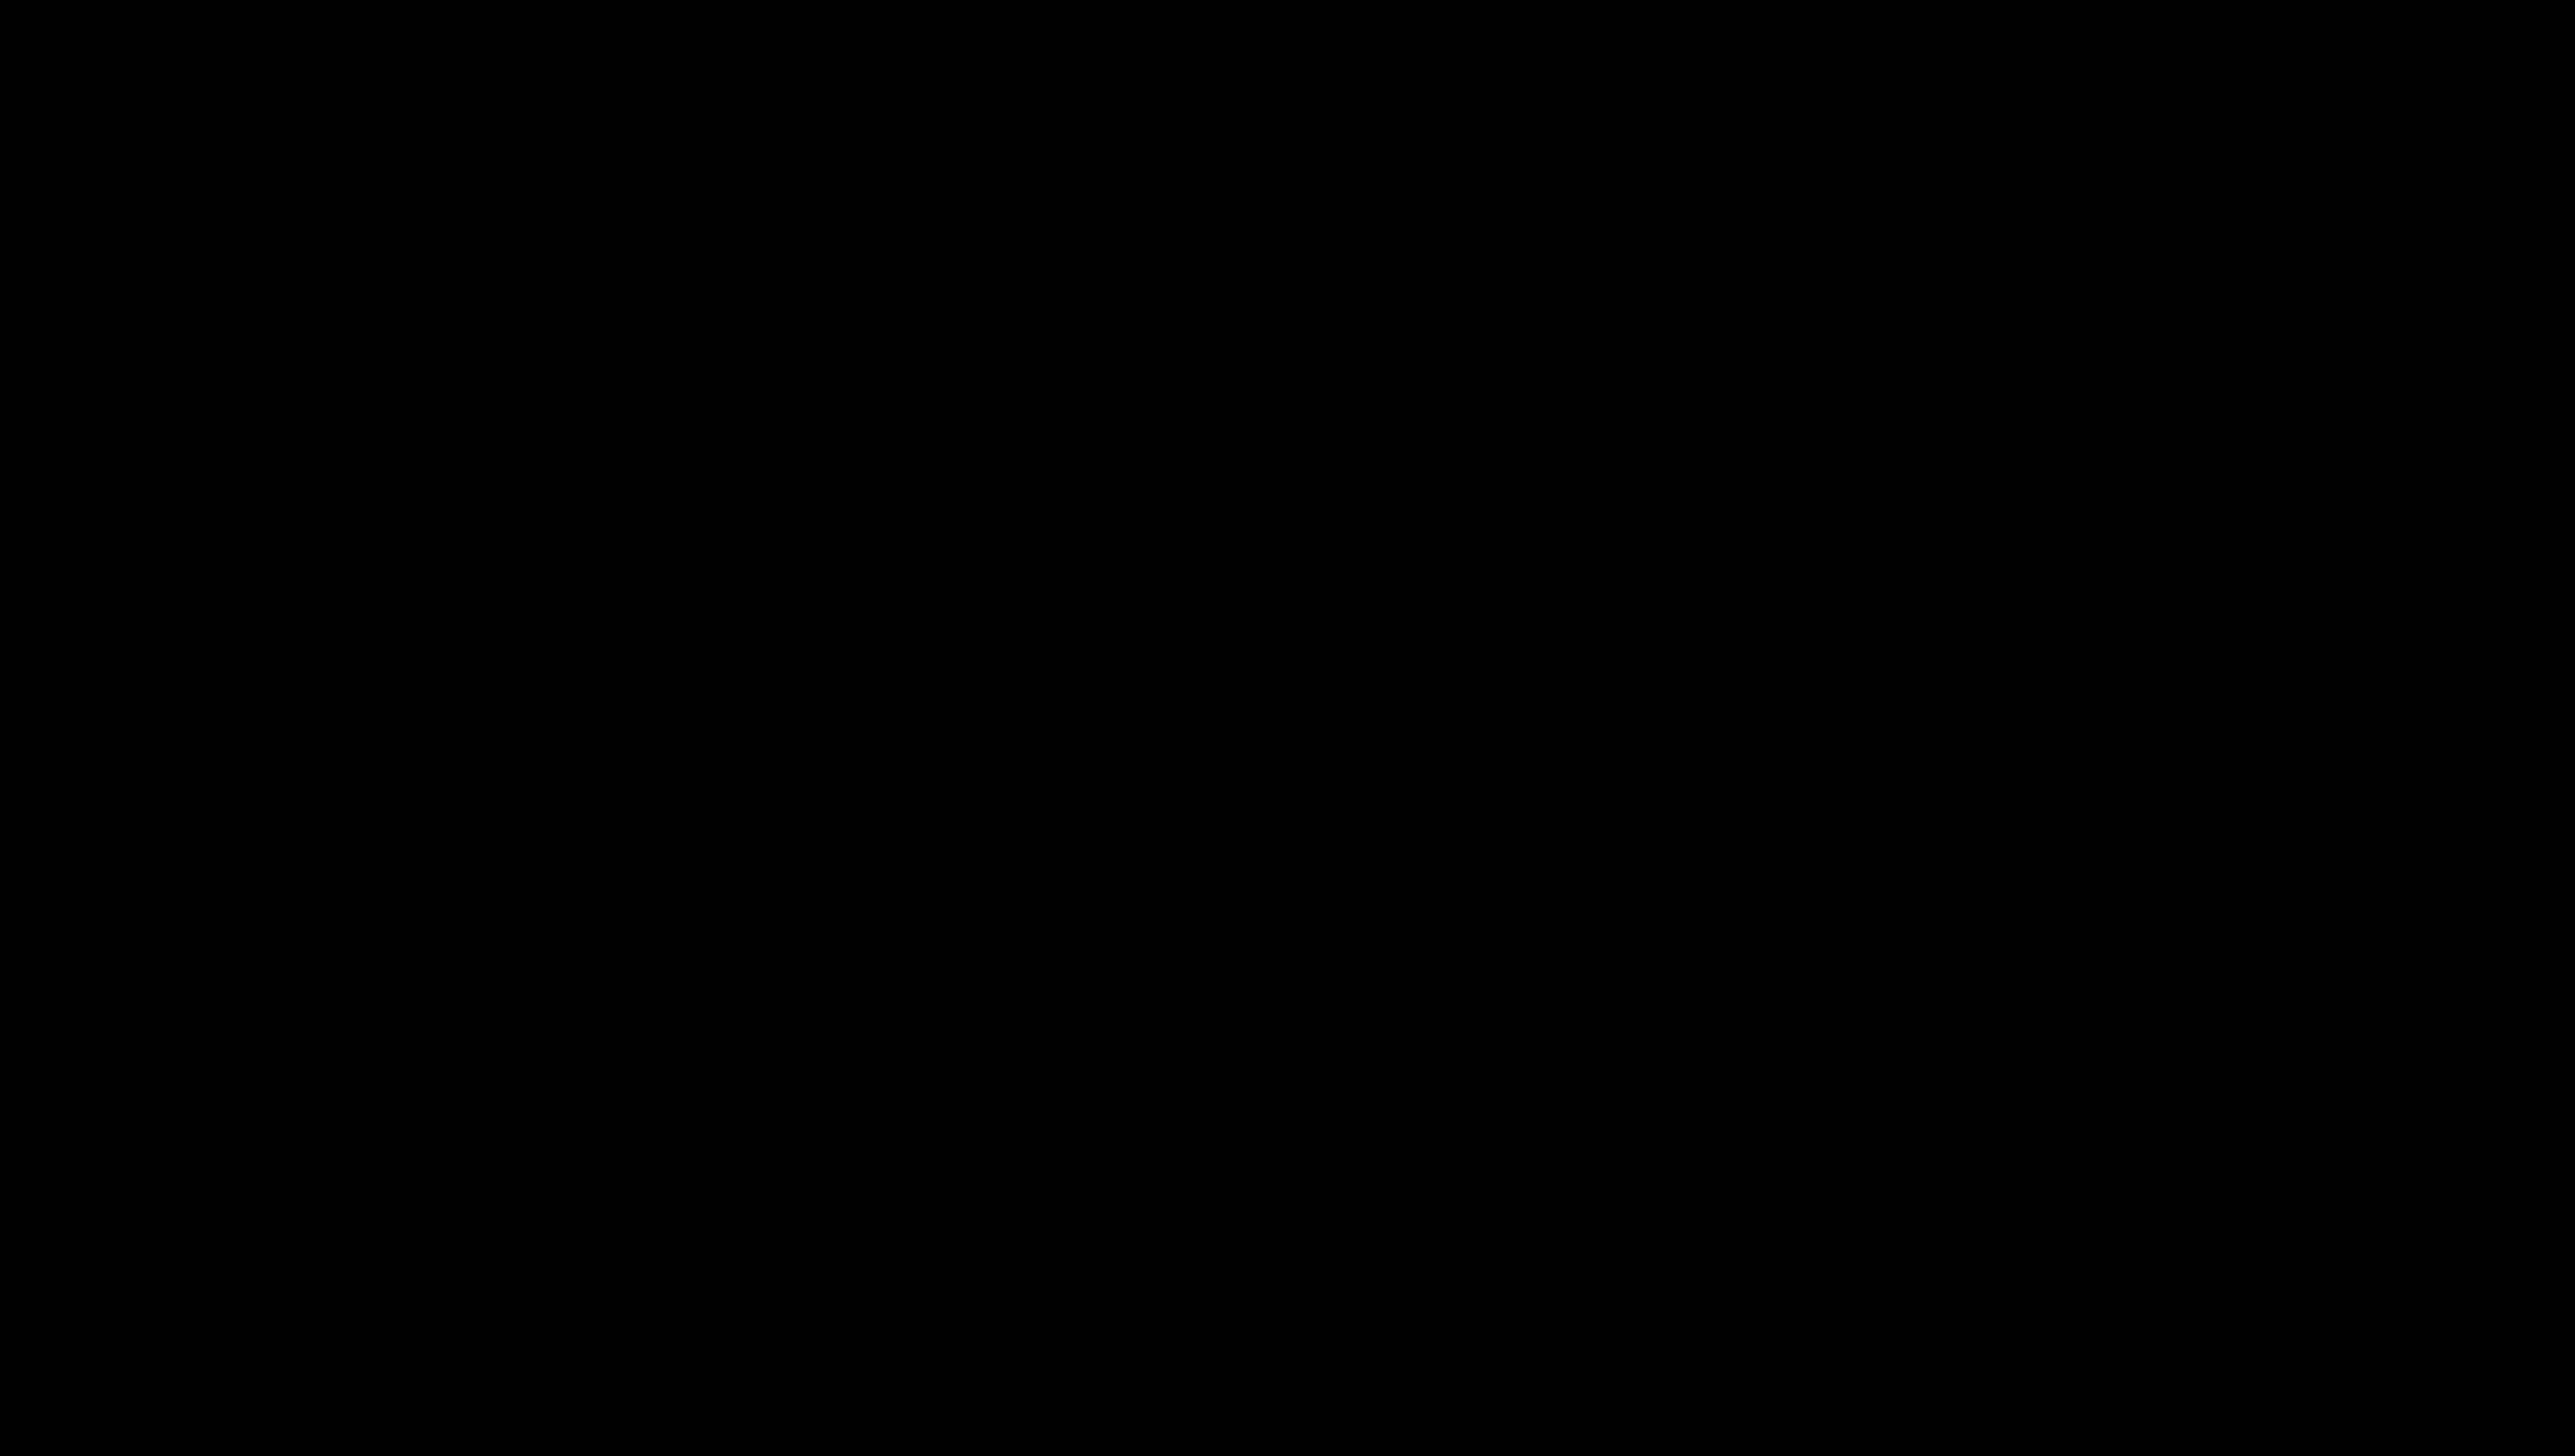 imag5302